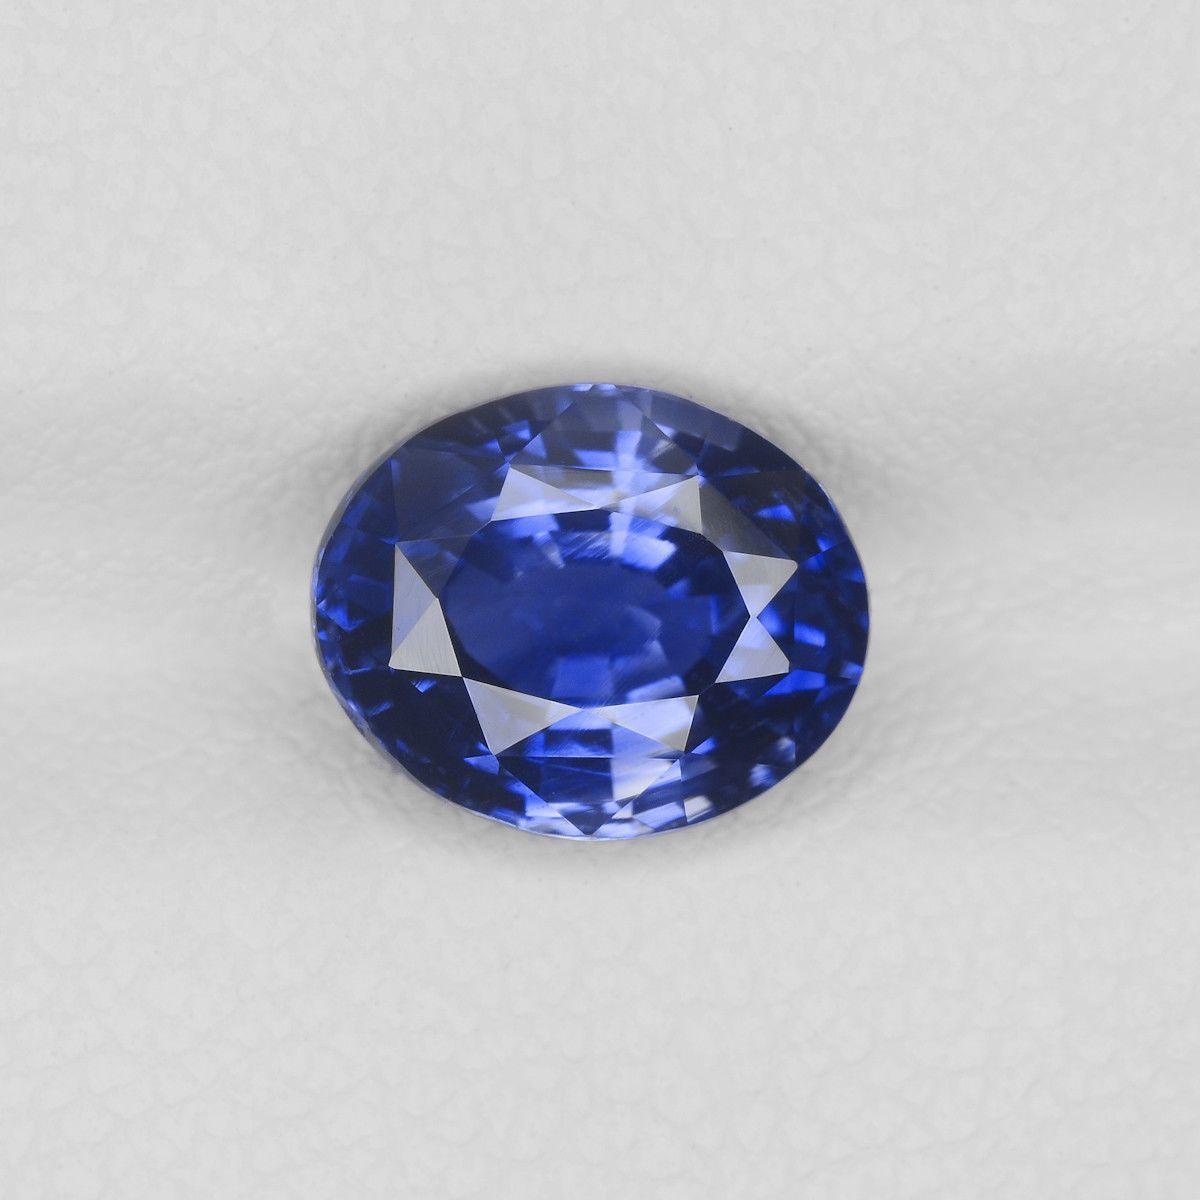 5 4 Cts Natural Blue Sapphire Round Faceted Gemstone September Birthstone Loose Gemstone Buyerstops Natural Blue Sapphire Blue Sapphire Bracelet Star Sapphire Gemstone